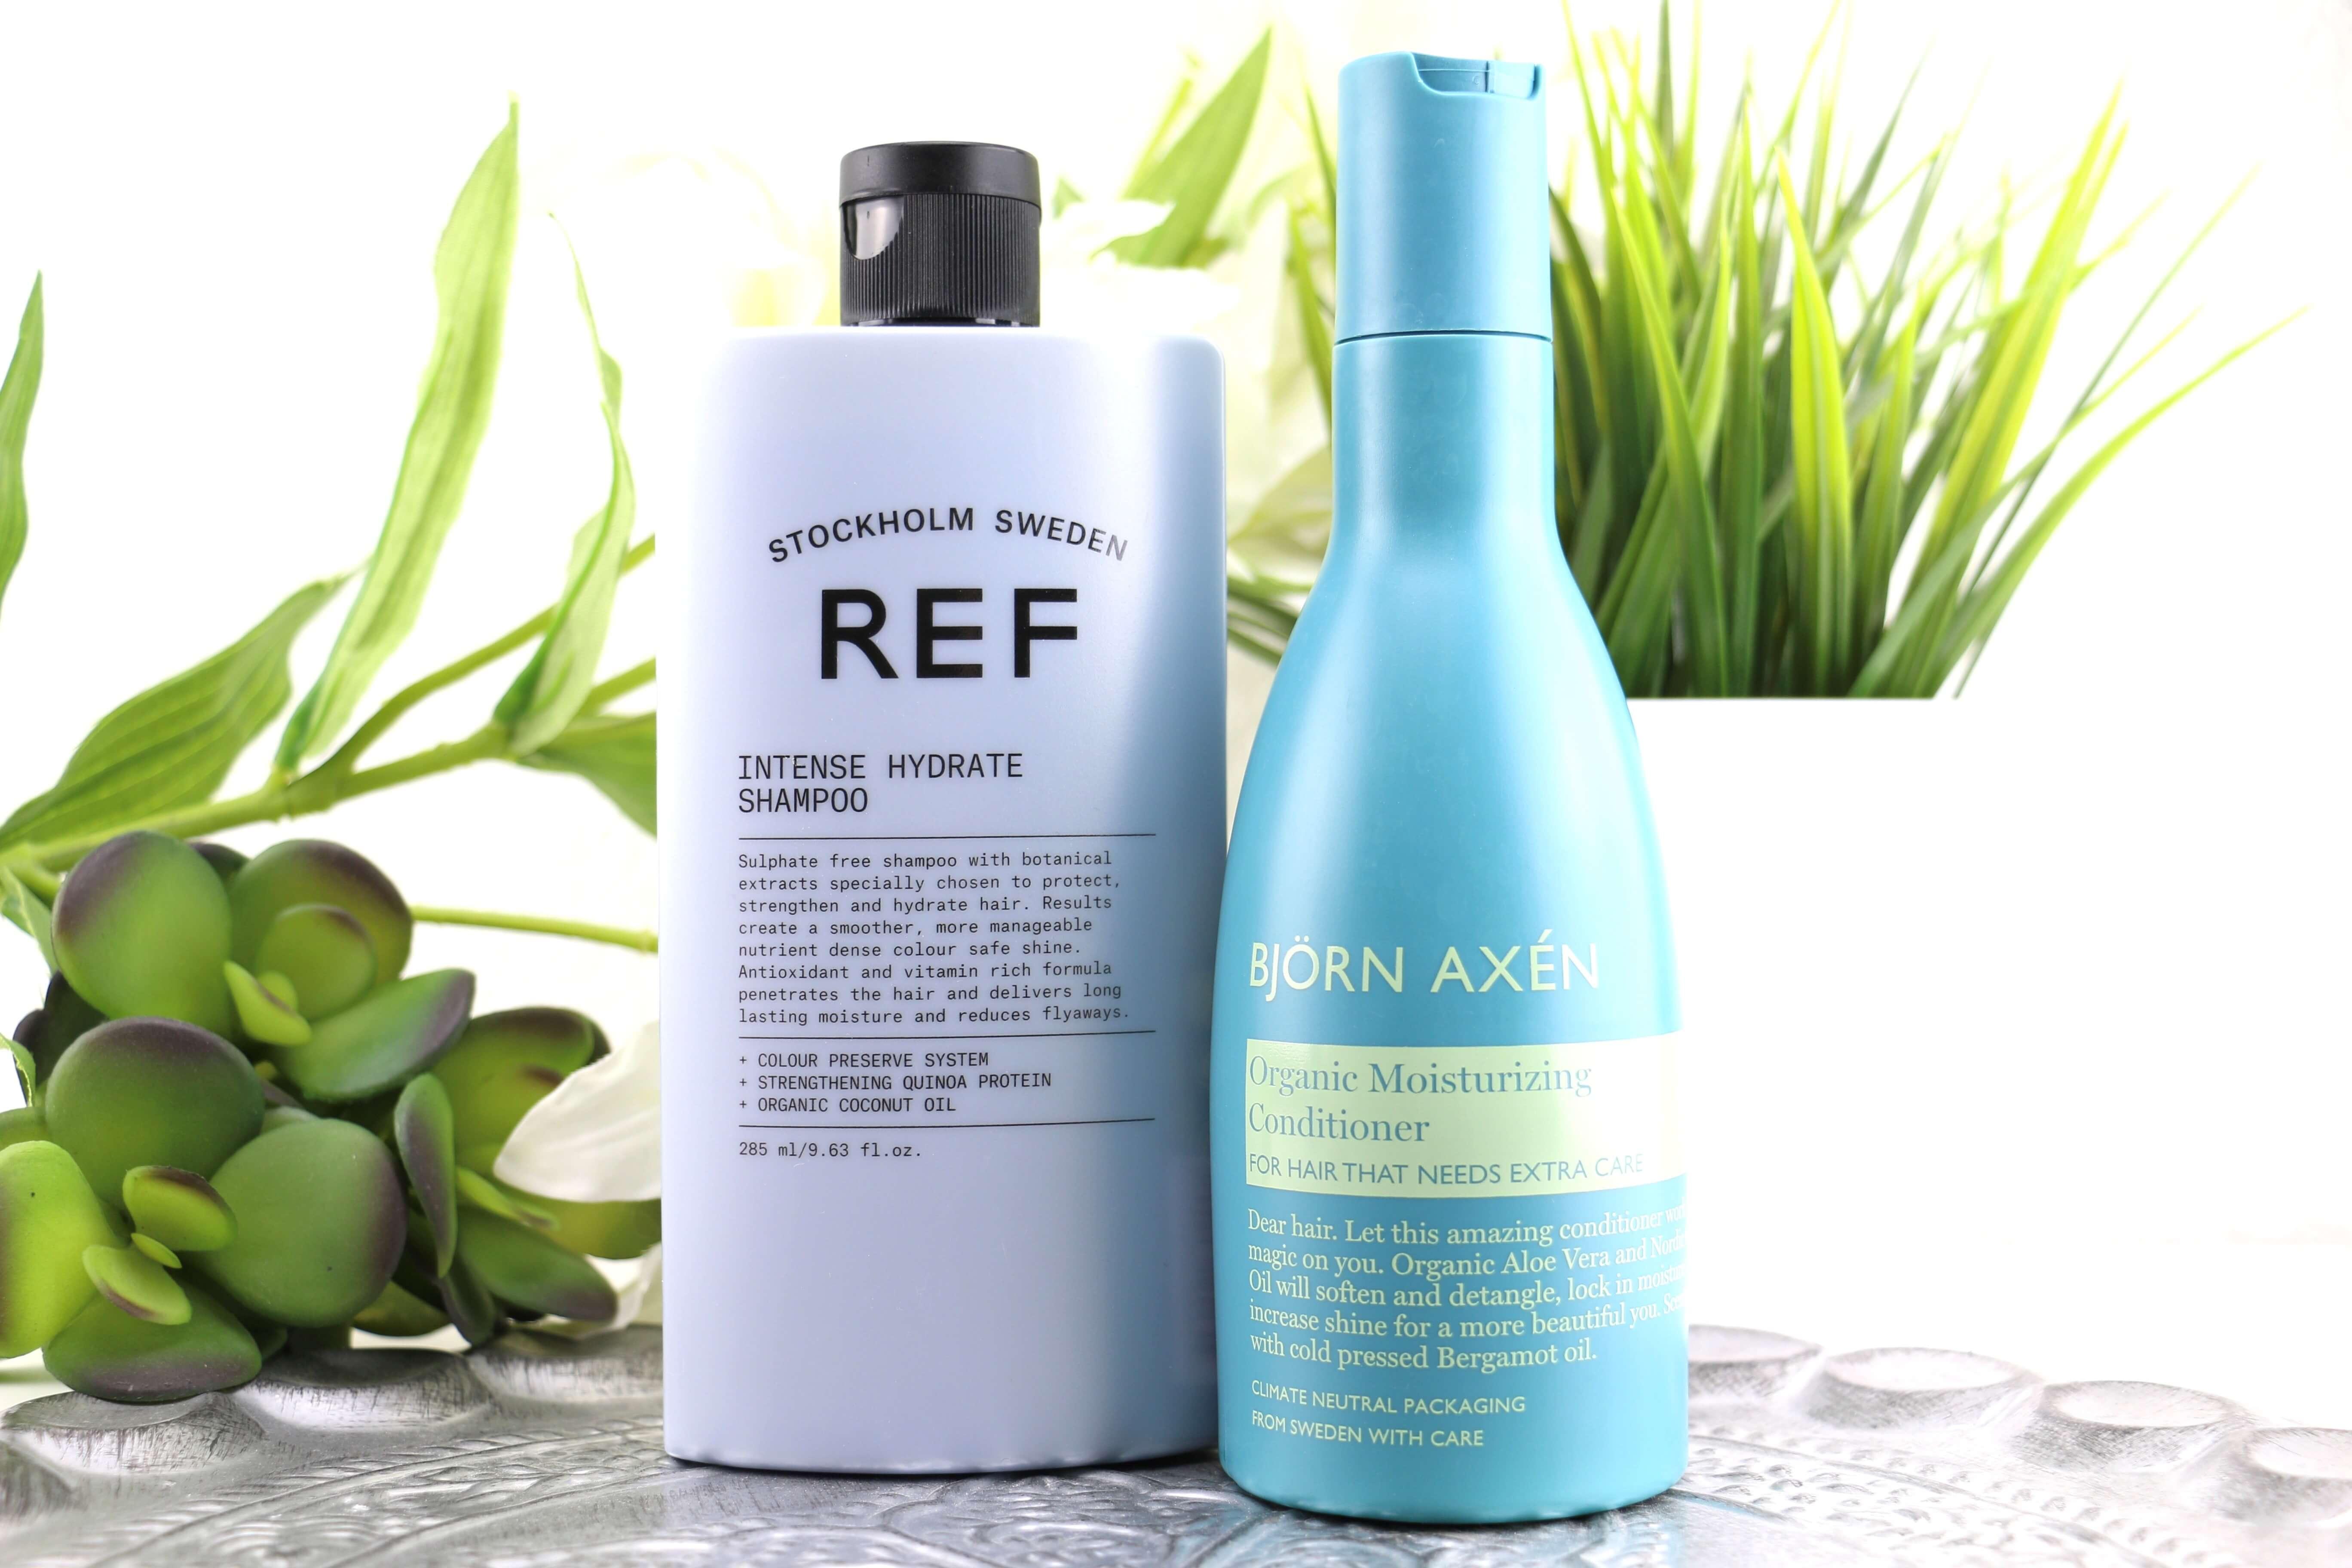 REF-Intens-Hydrate-Shampoo-Bjorn-Axen-Organic